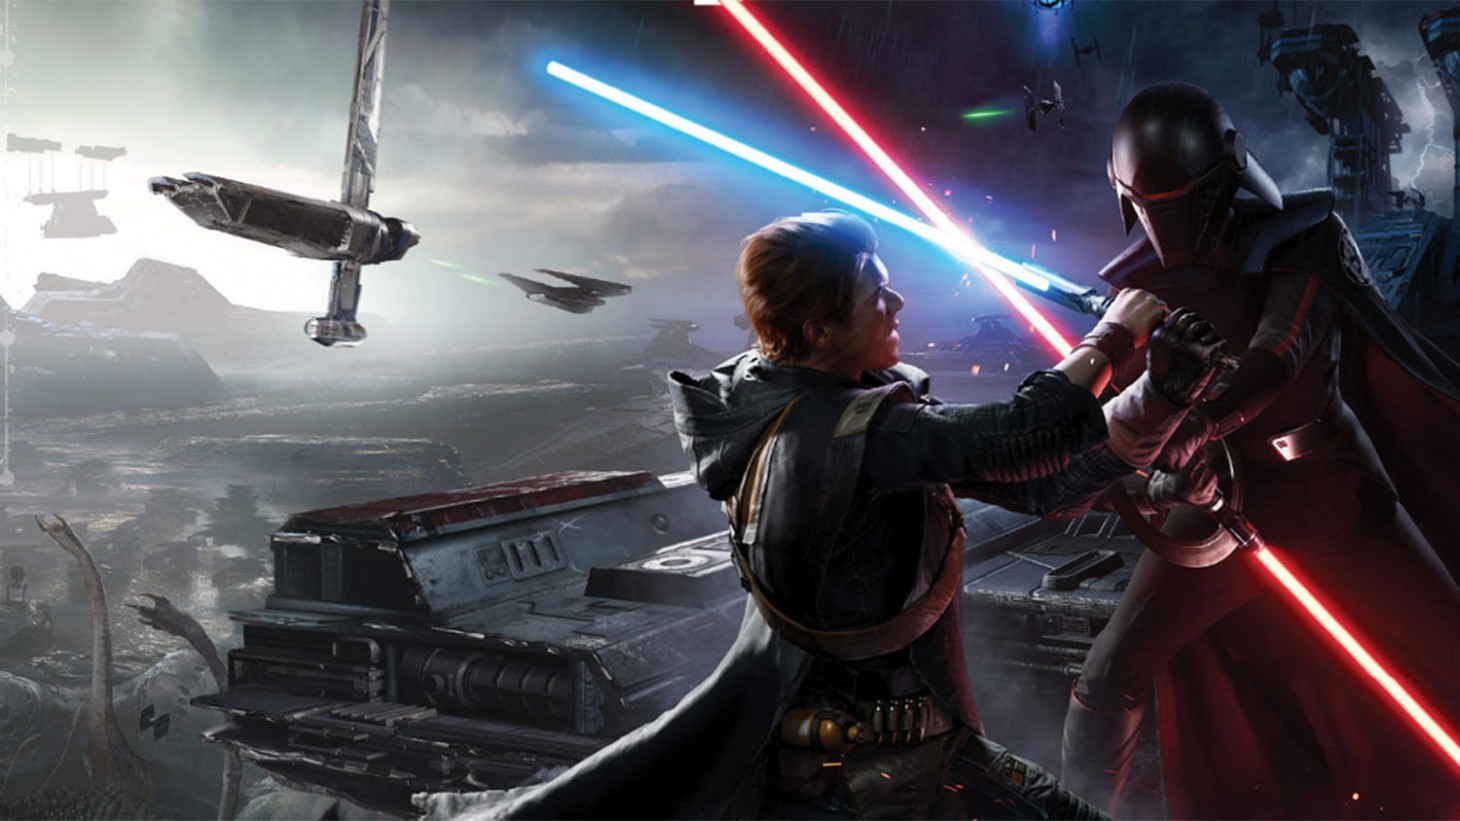 Prévia: Star Wars Jedi: Fallen Order (Multi) promete ser a força ...